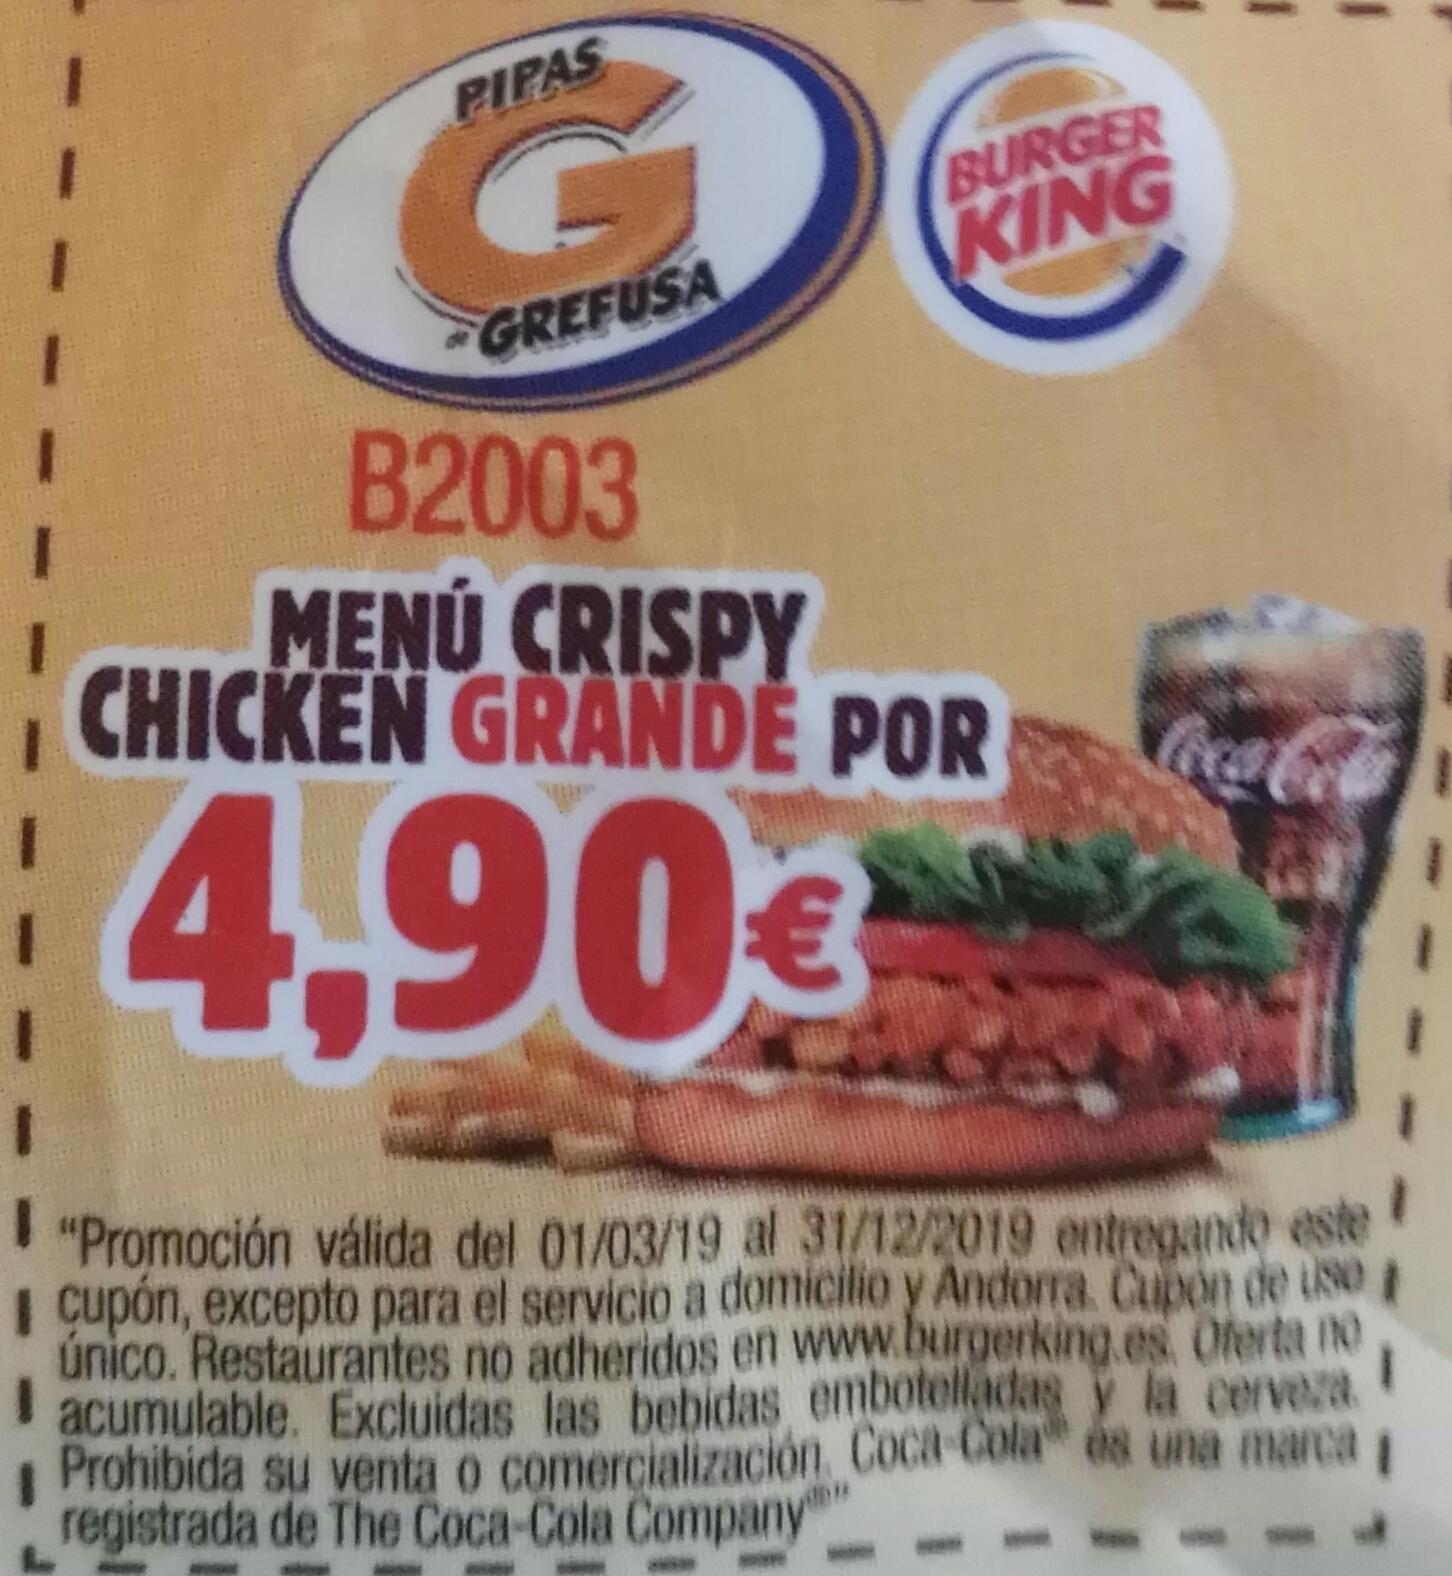 [BK] Menú Crispy Chicken GRANDE (Código On-line O En restaurante)